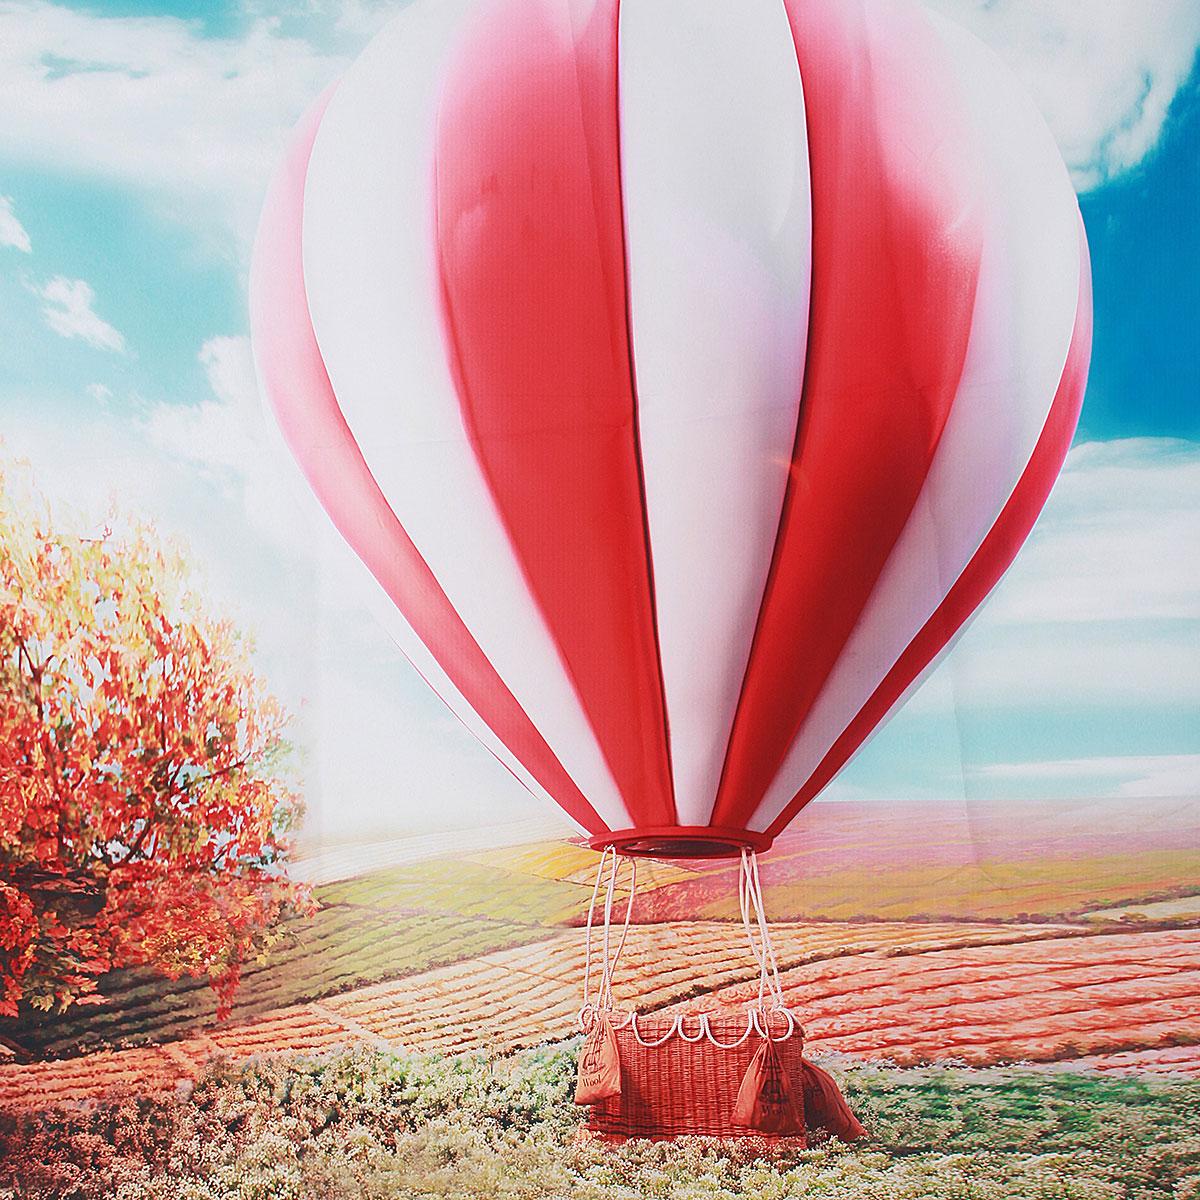 3x5ft Vinyl Hot Balloon Blue Sky Photography Background Backdrop Photo Studio Prop